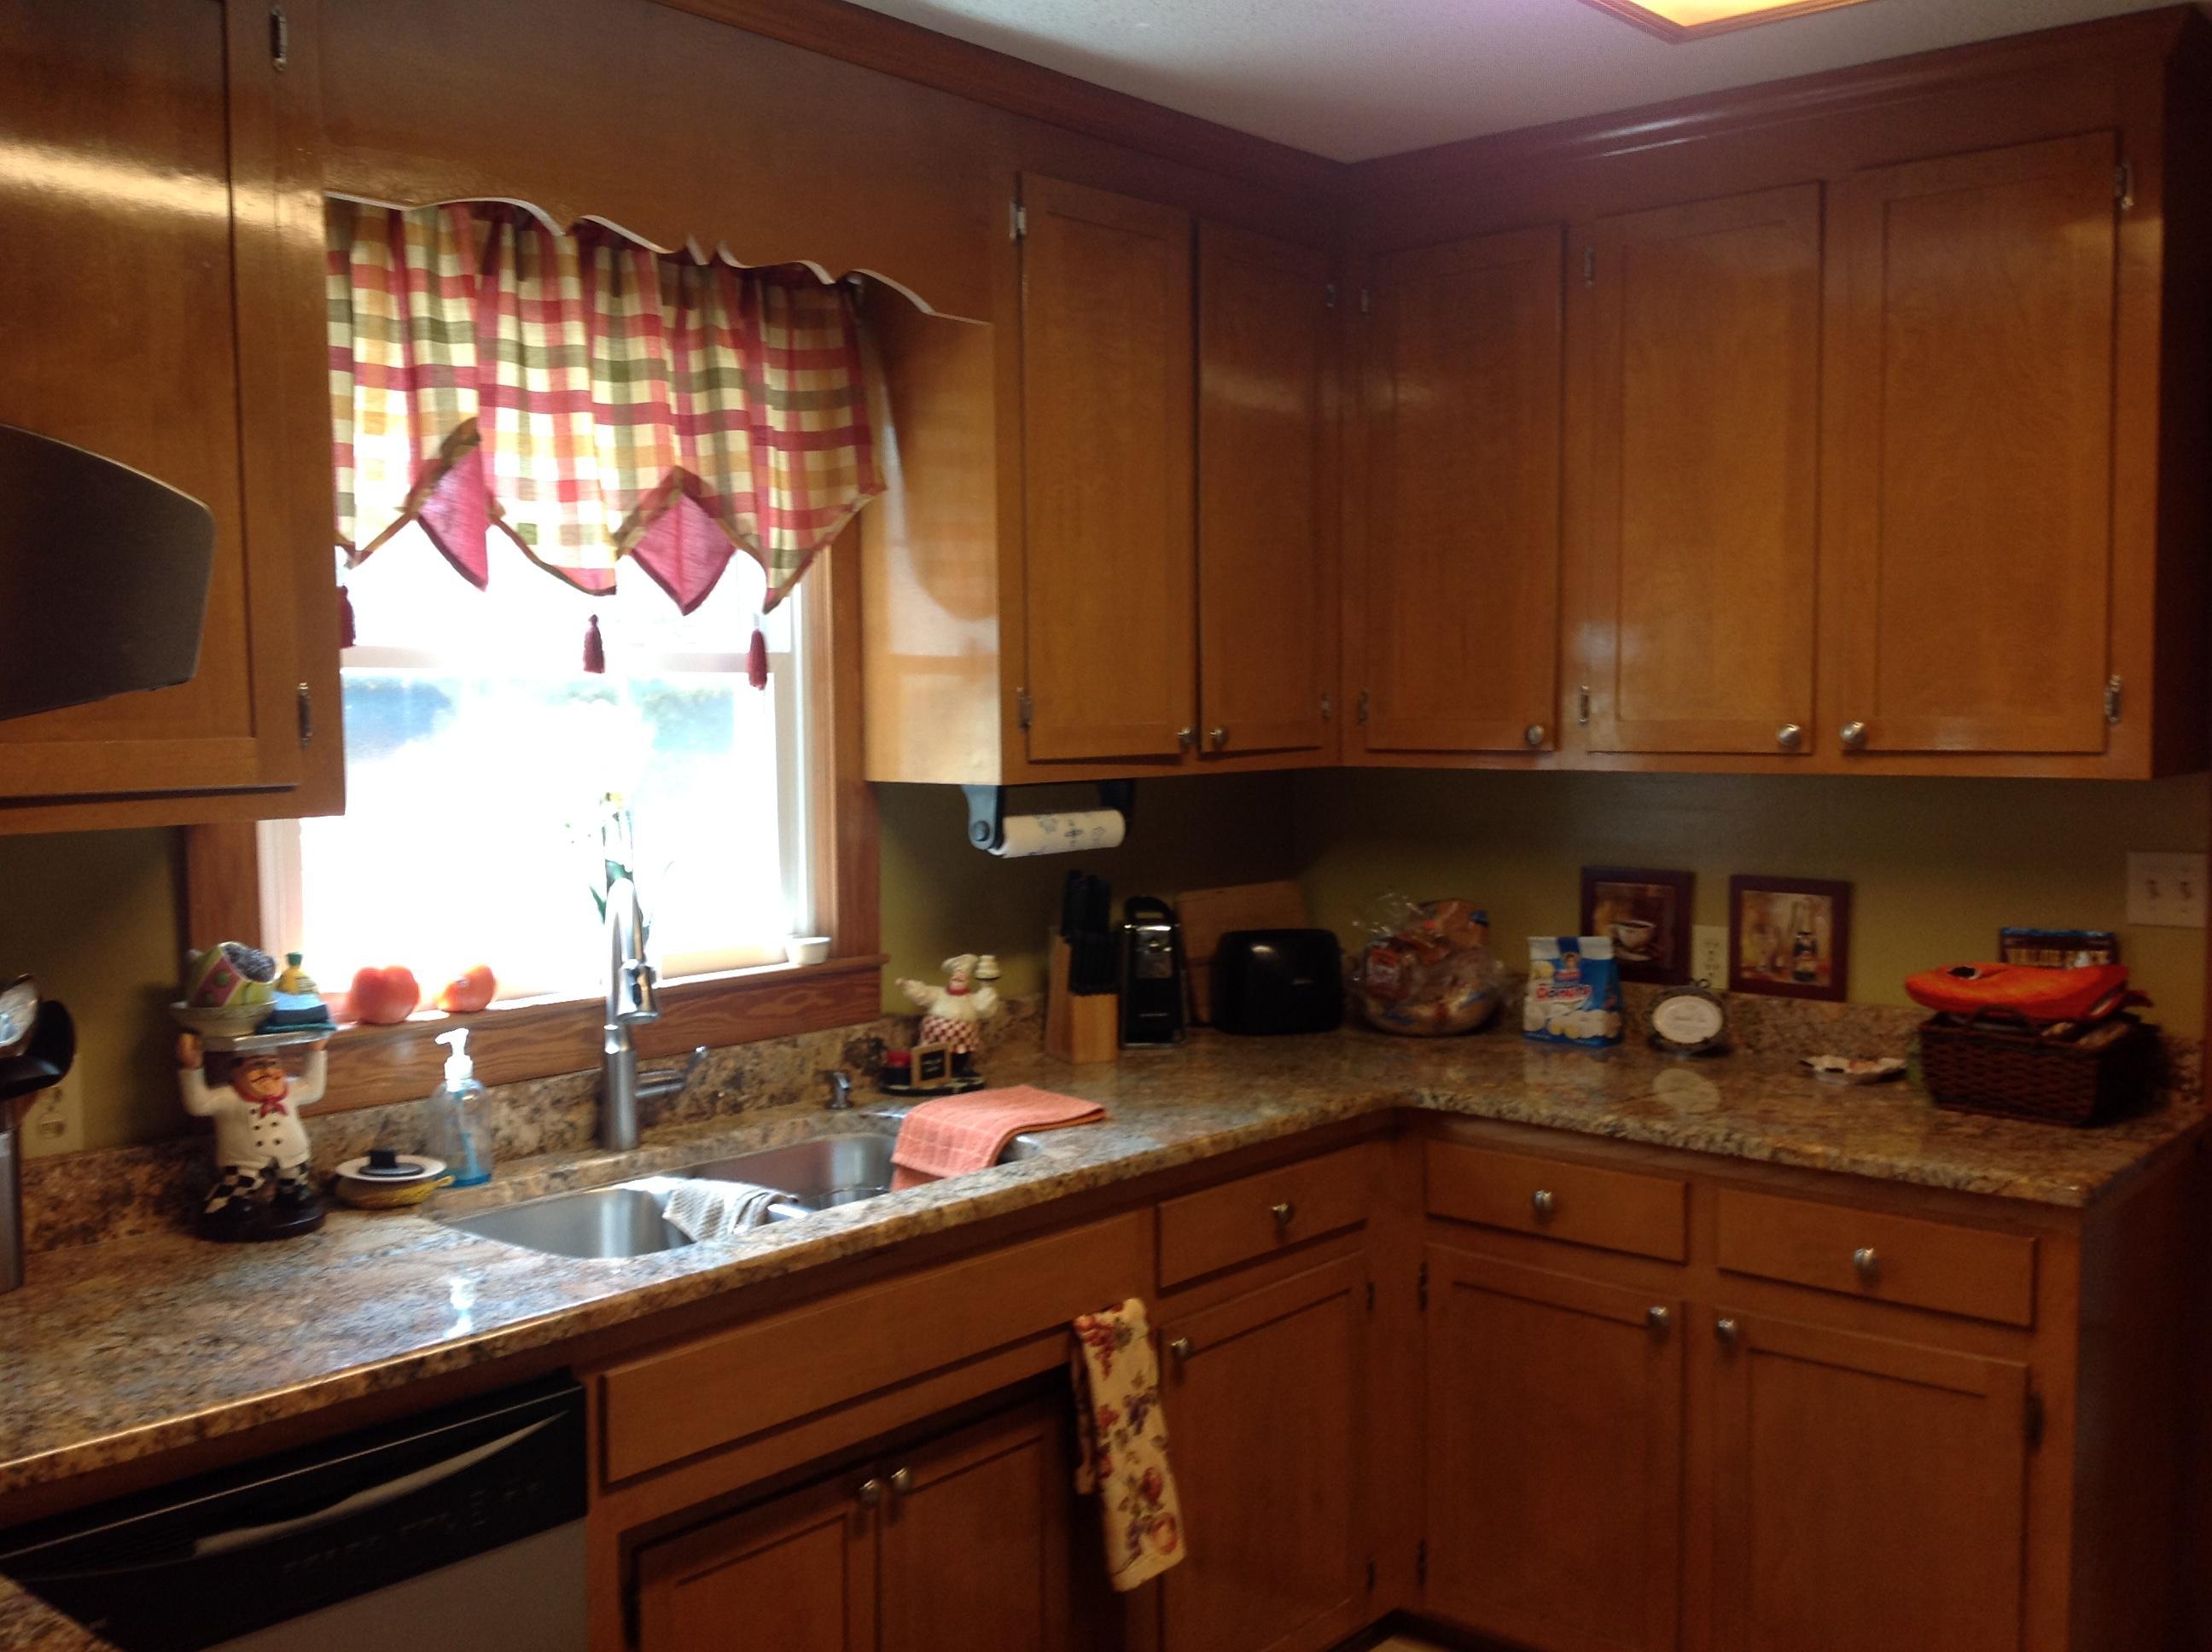 Belvedere II Homes For Sale - 122 Dogwood, Eutawville, SC - 33